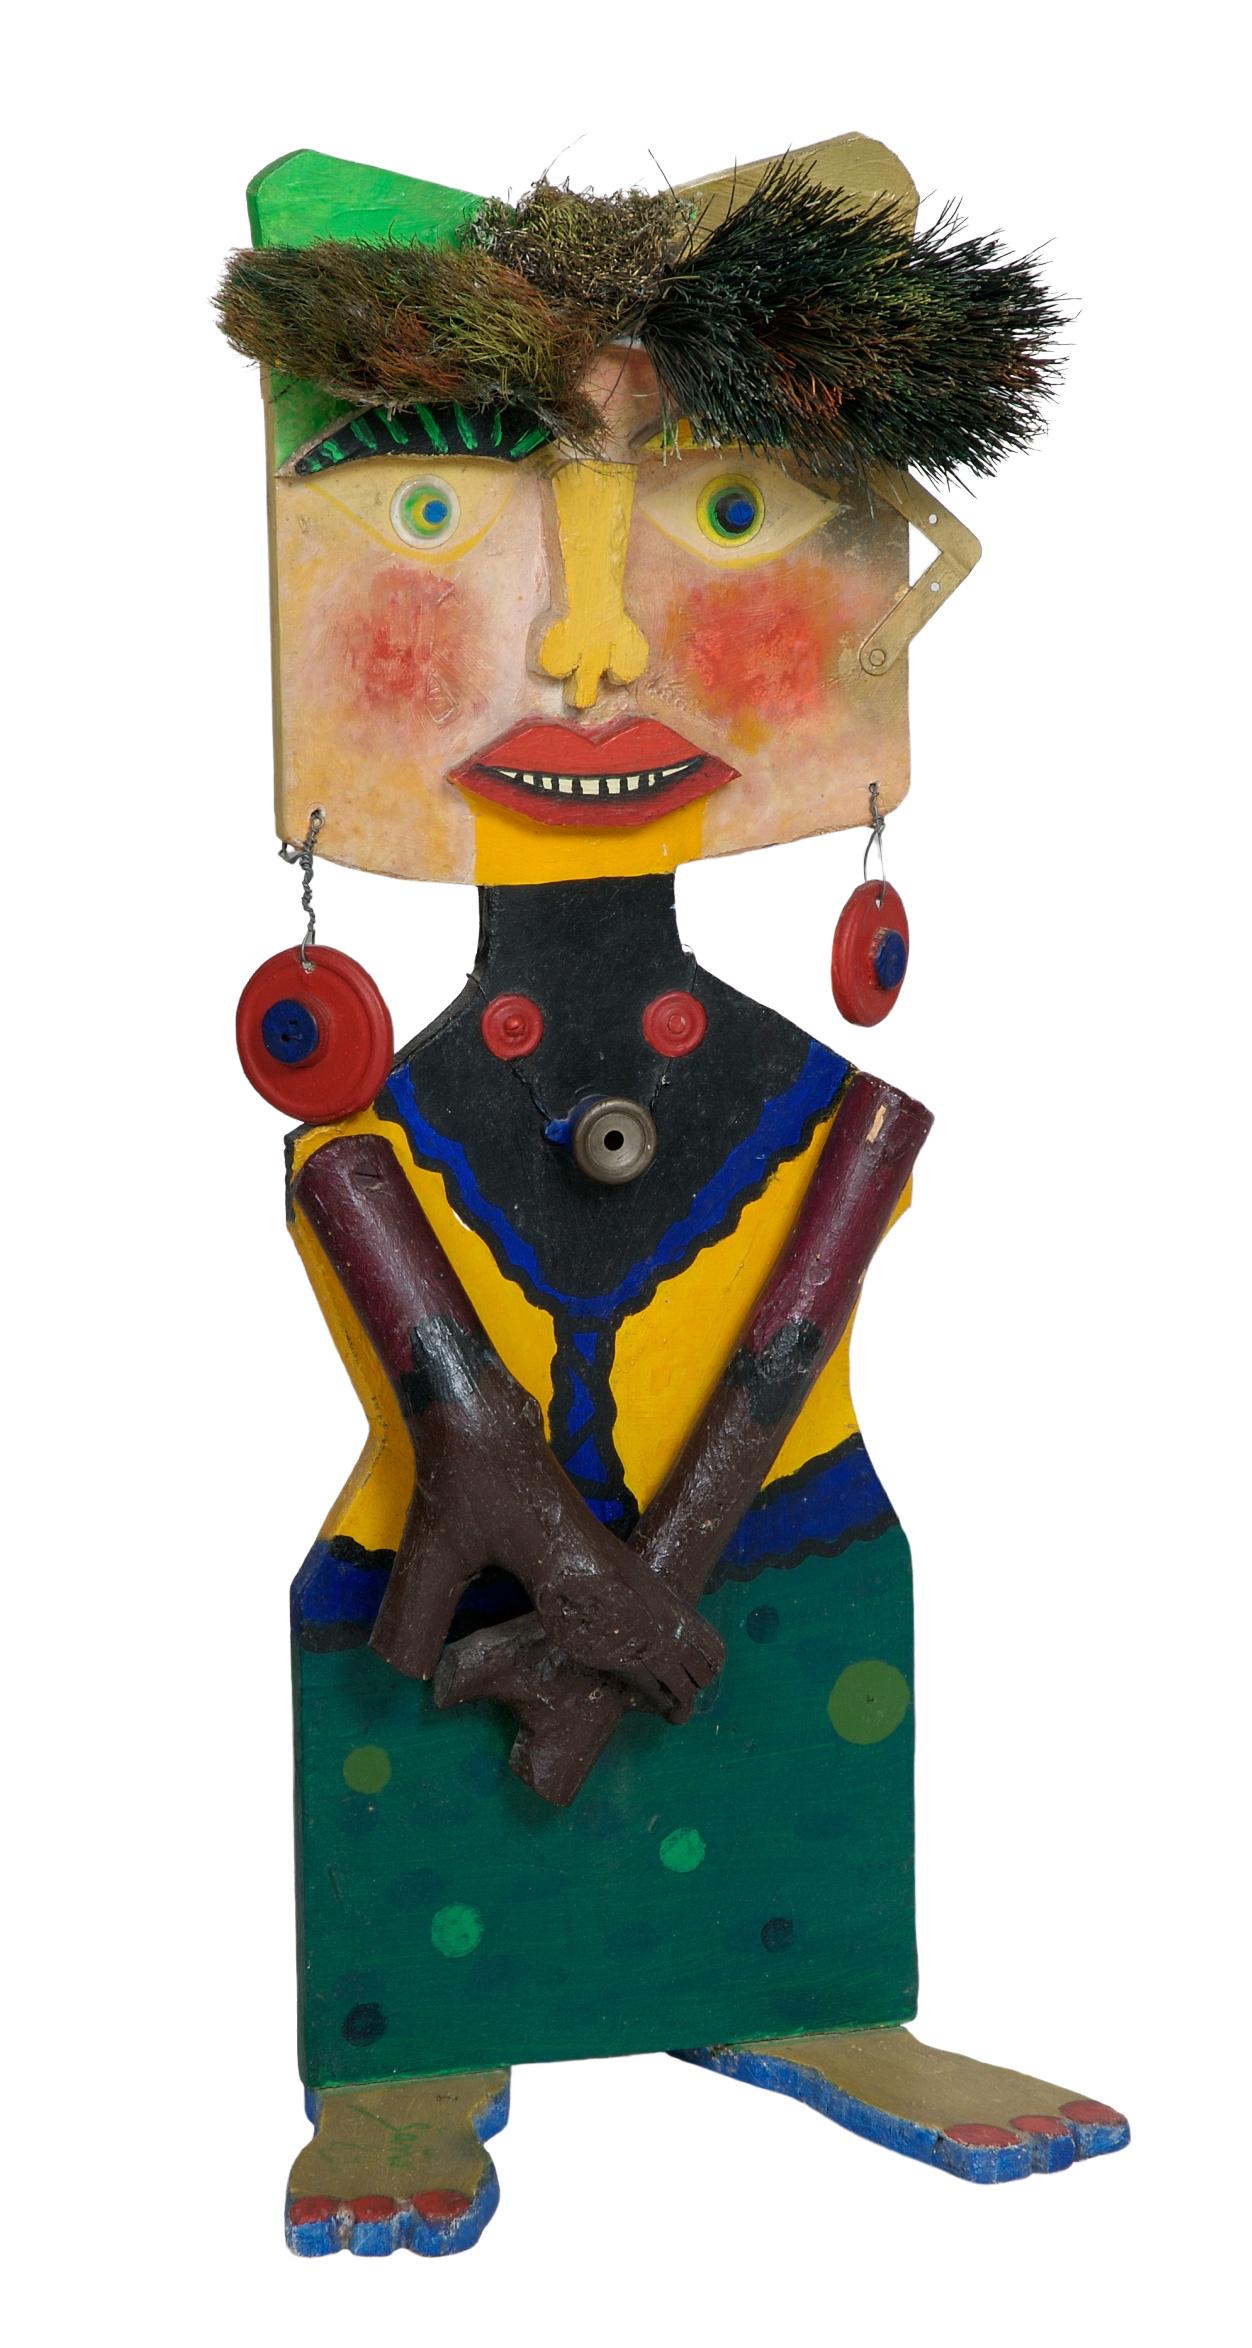 Frida-k-sculpture-sano-ludovit-daniel